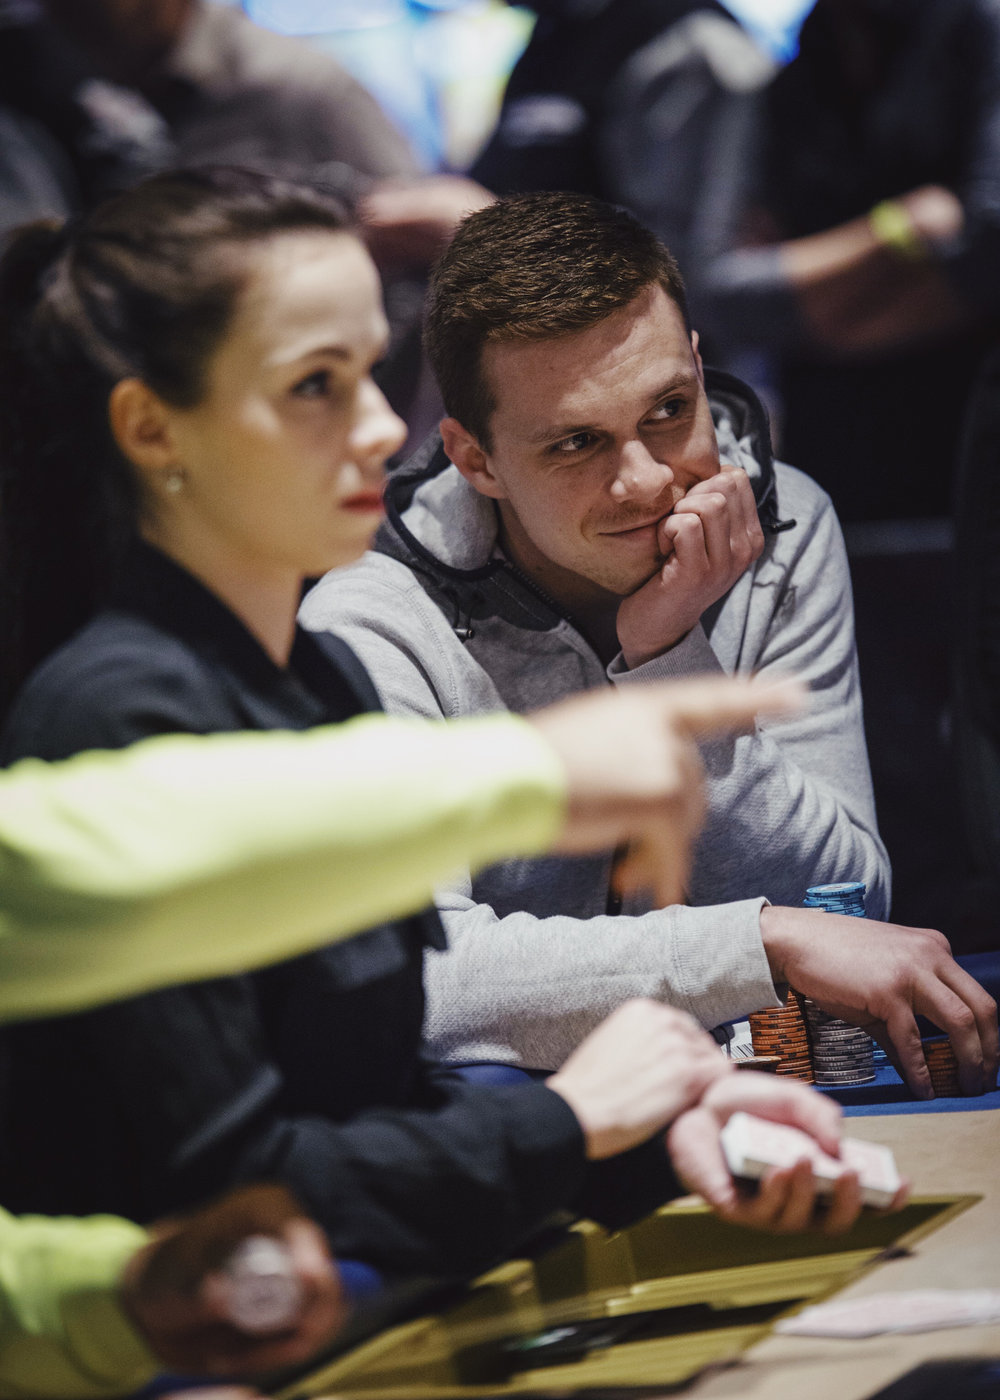 polina-shubkina-poker-035.JPG